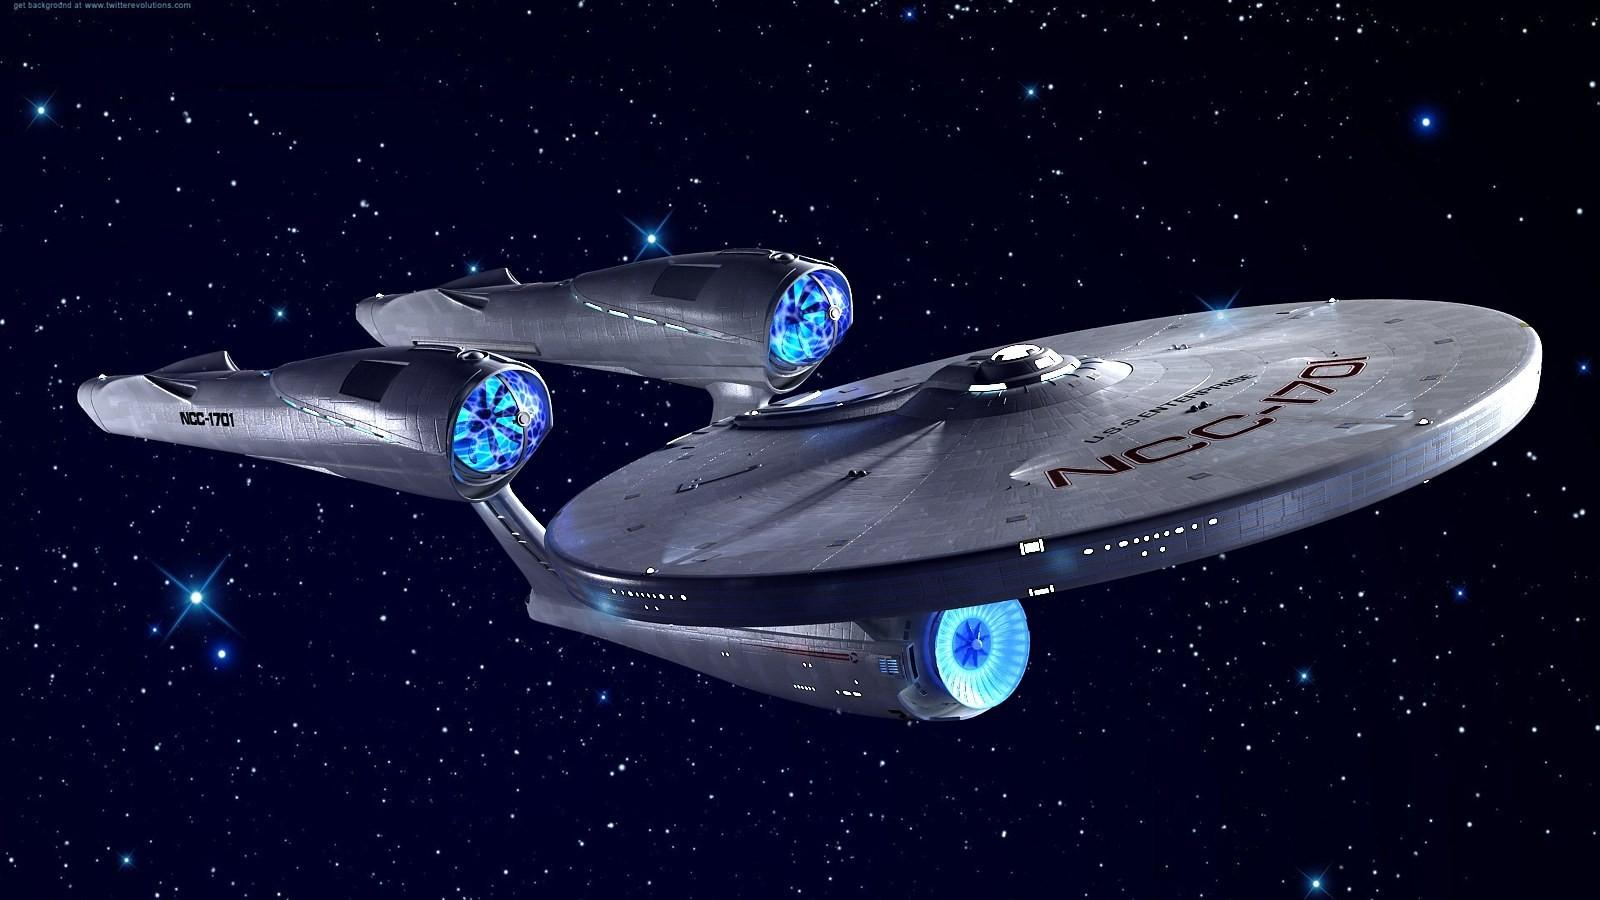 MOC-28267 Space U.S.S Enterprise NCC-1701-B Excelsior Class Refit – Star Trek Generations Designed By StarTrekDesigns With 531 Pieces